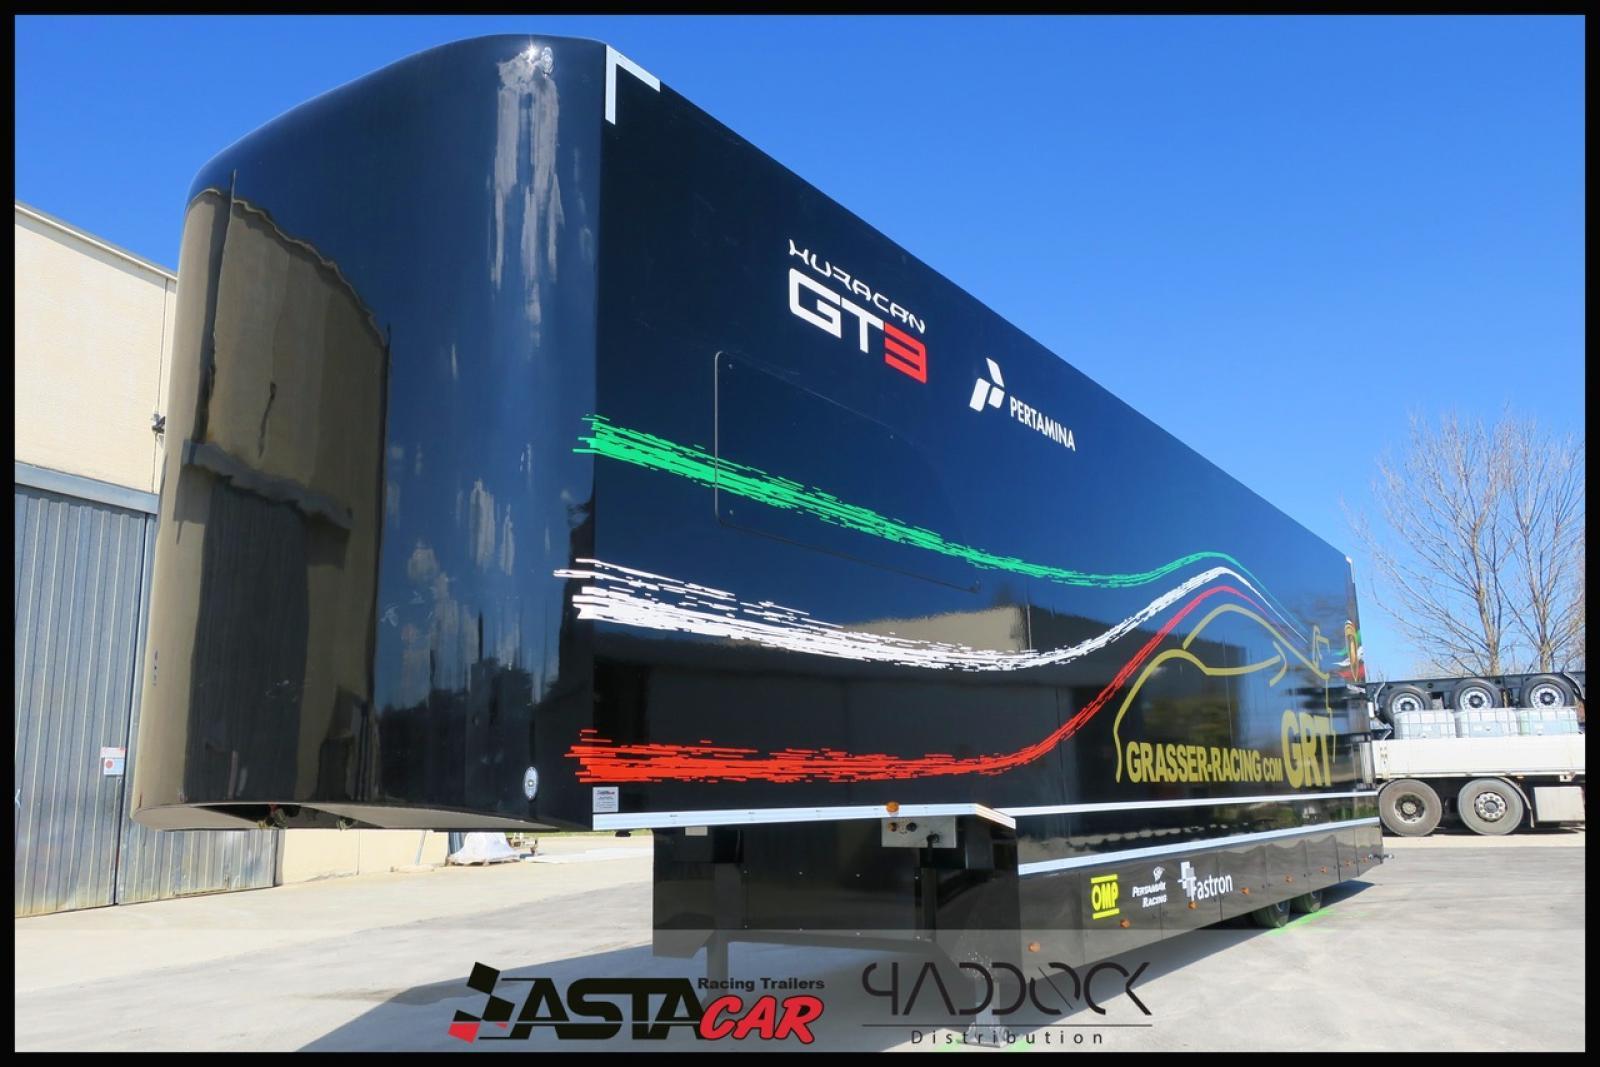 USED TRAILER ASTA CAR Y2 BY PADDOCK DISTRIBUTION - 1